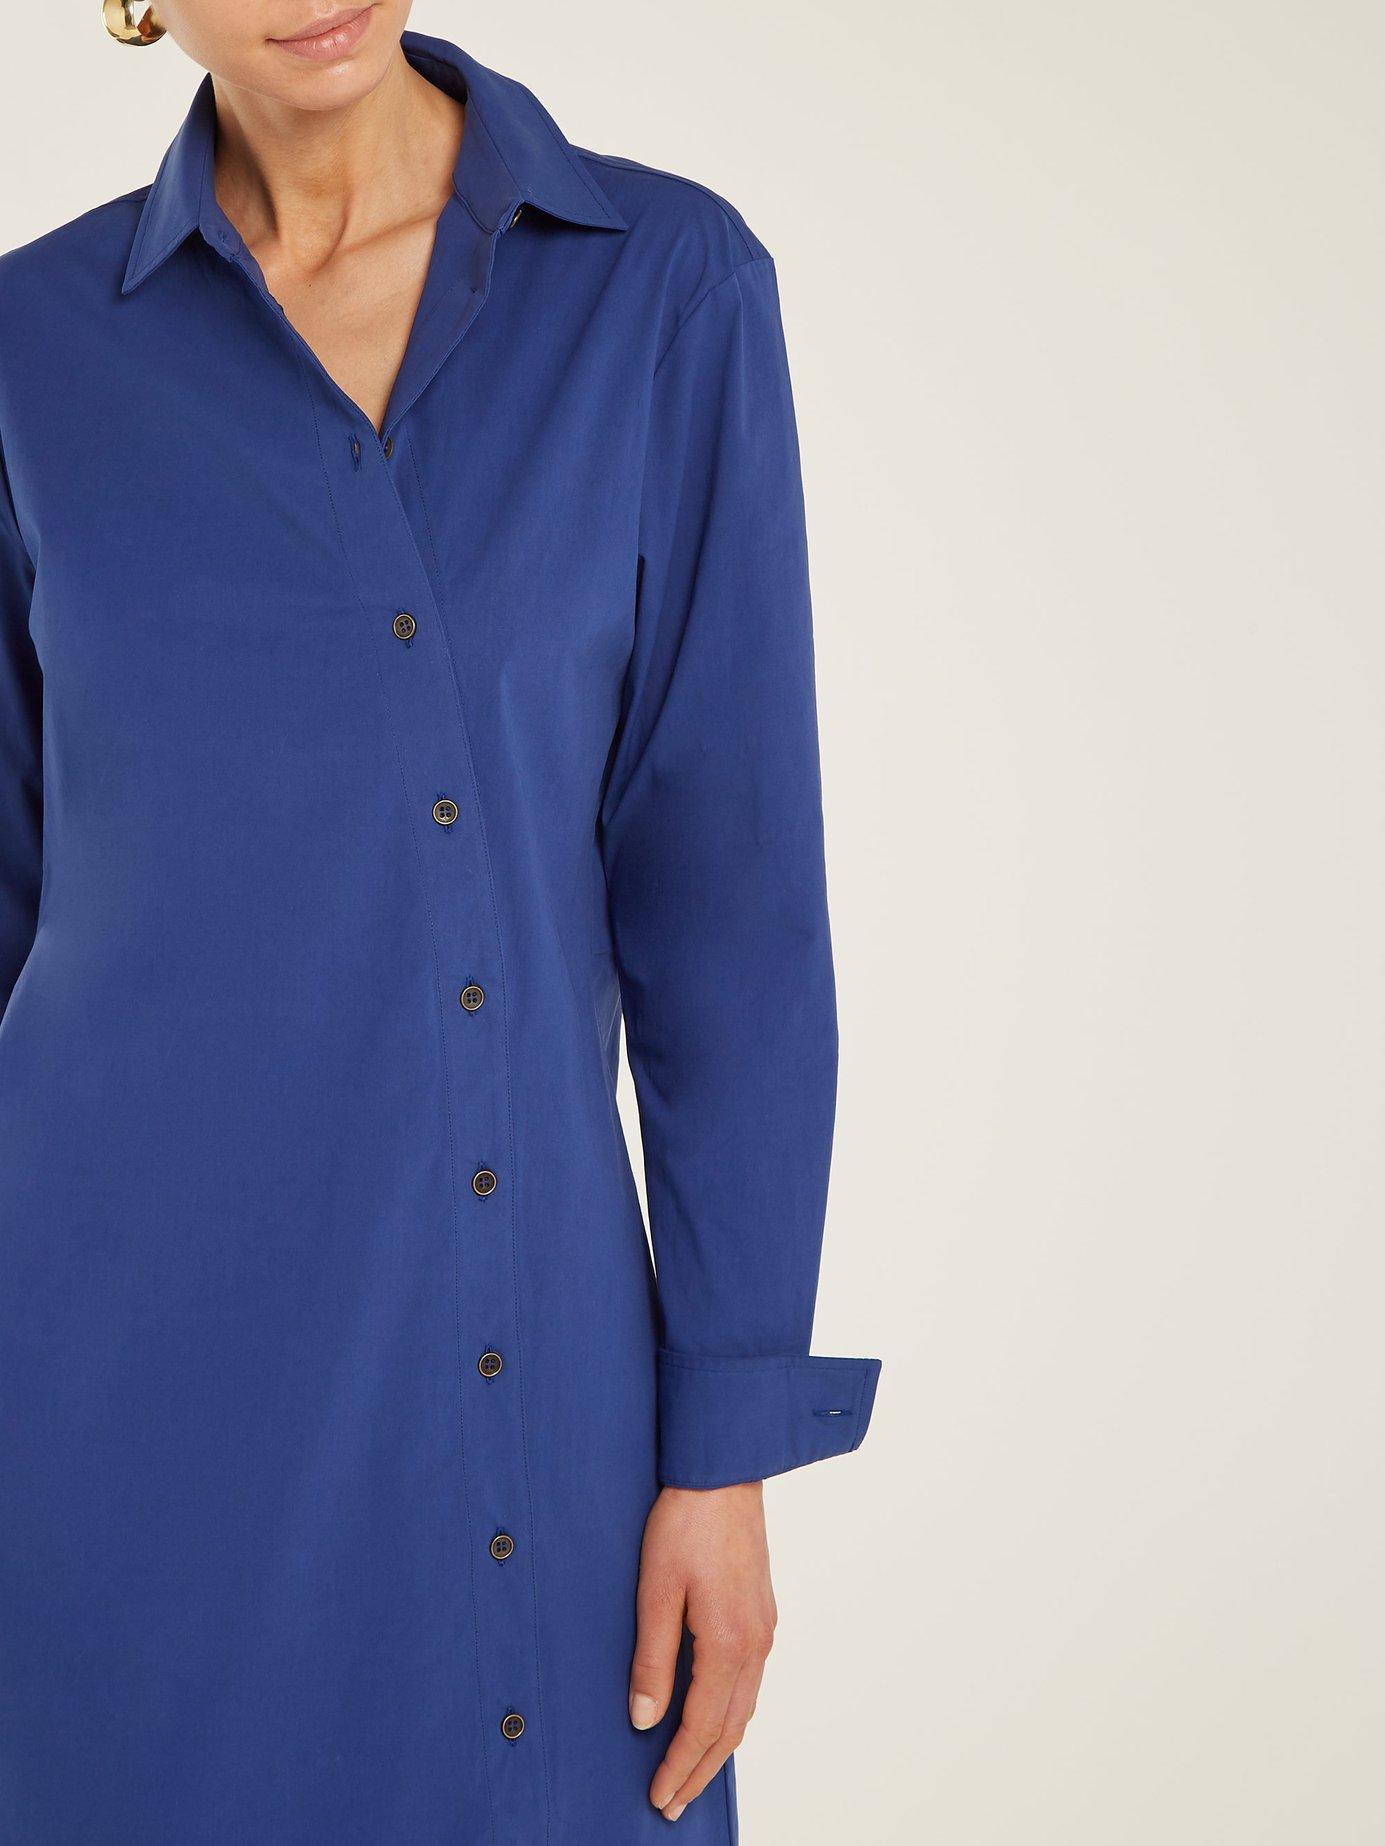 Cotton-poplin asymmetric-button dress by Tomas Maier